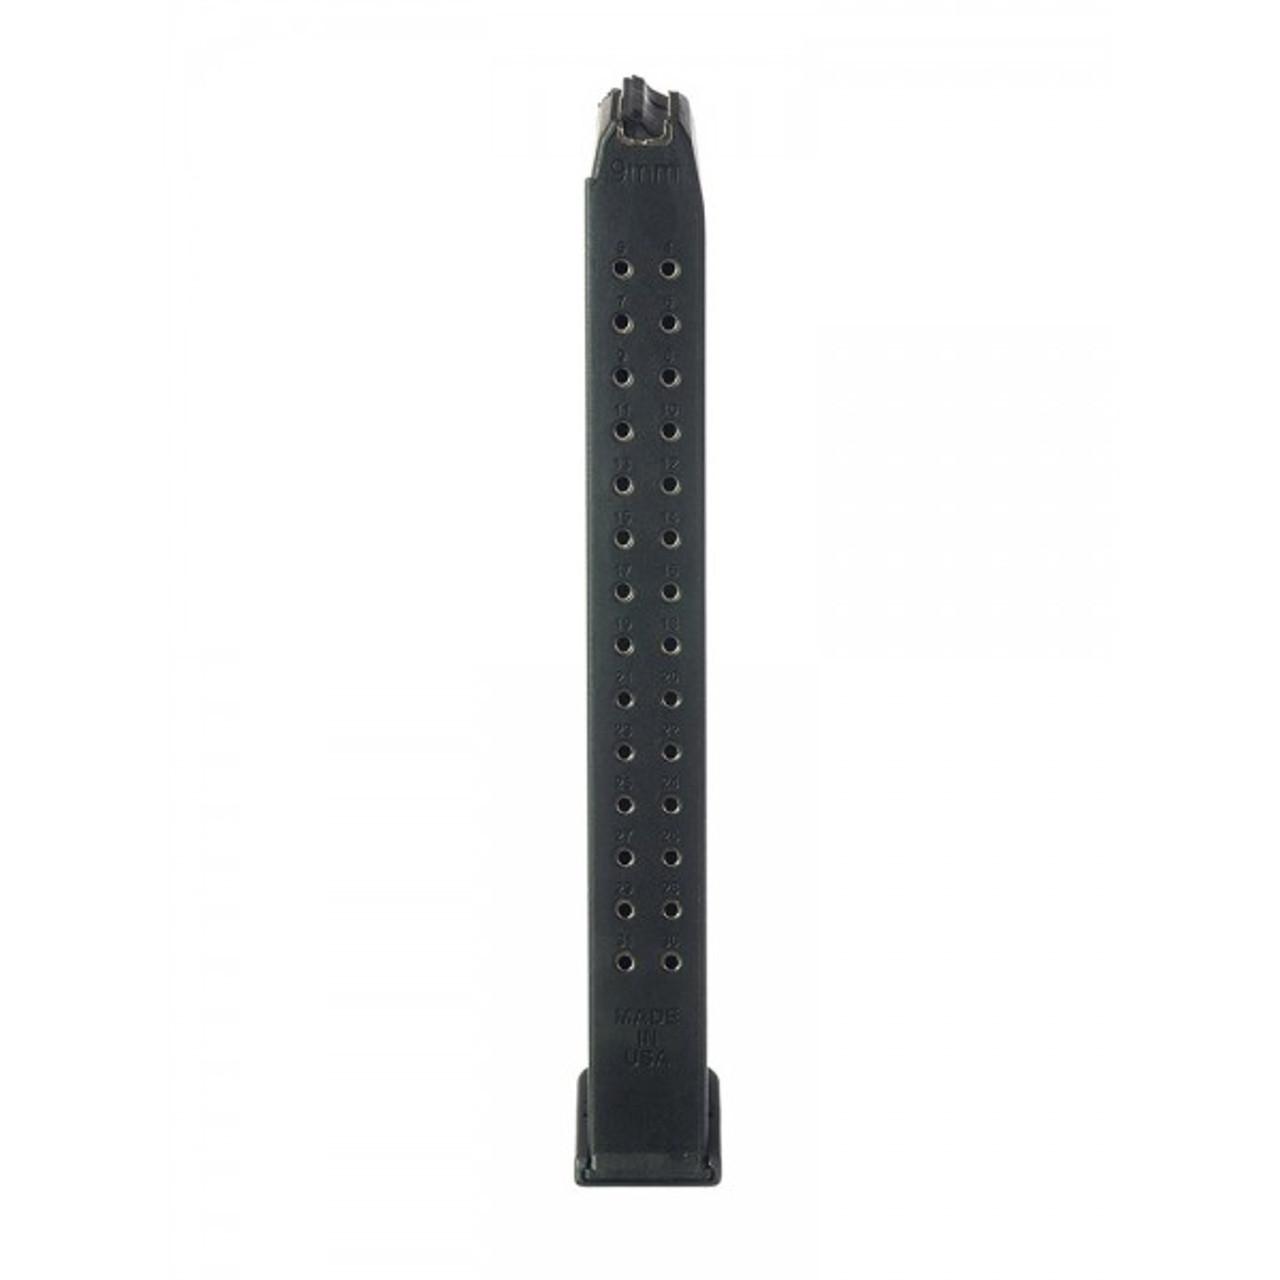 Promag Glock 17/19/26 Mag - 9mm 32rd